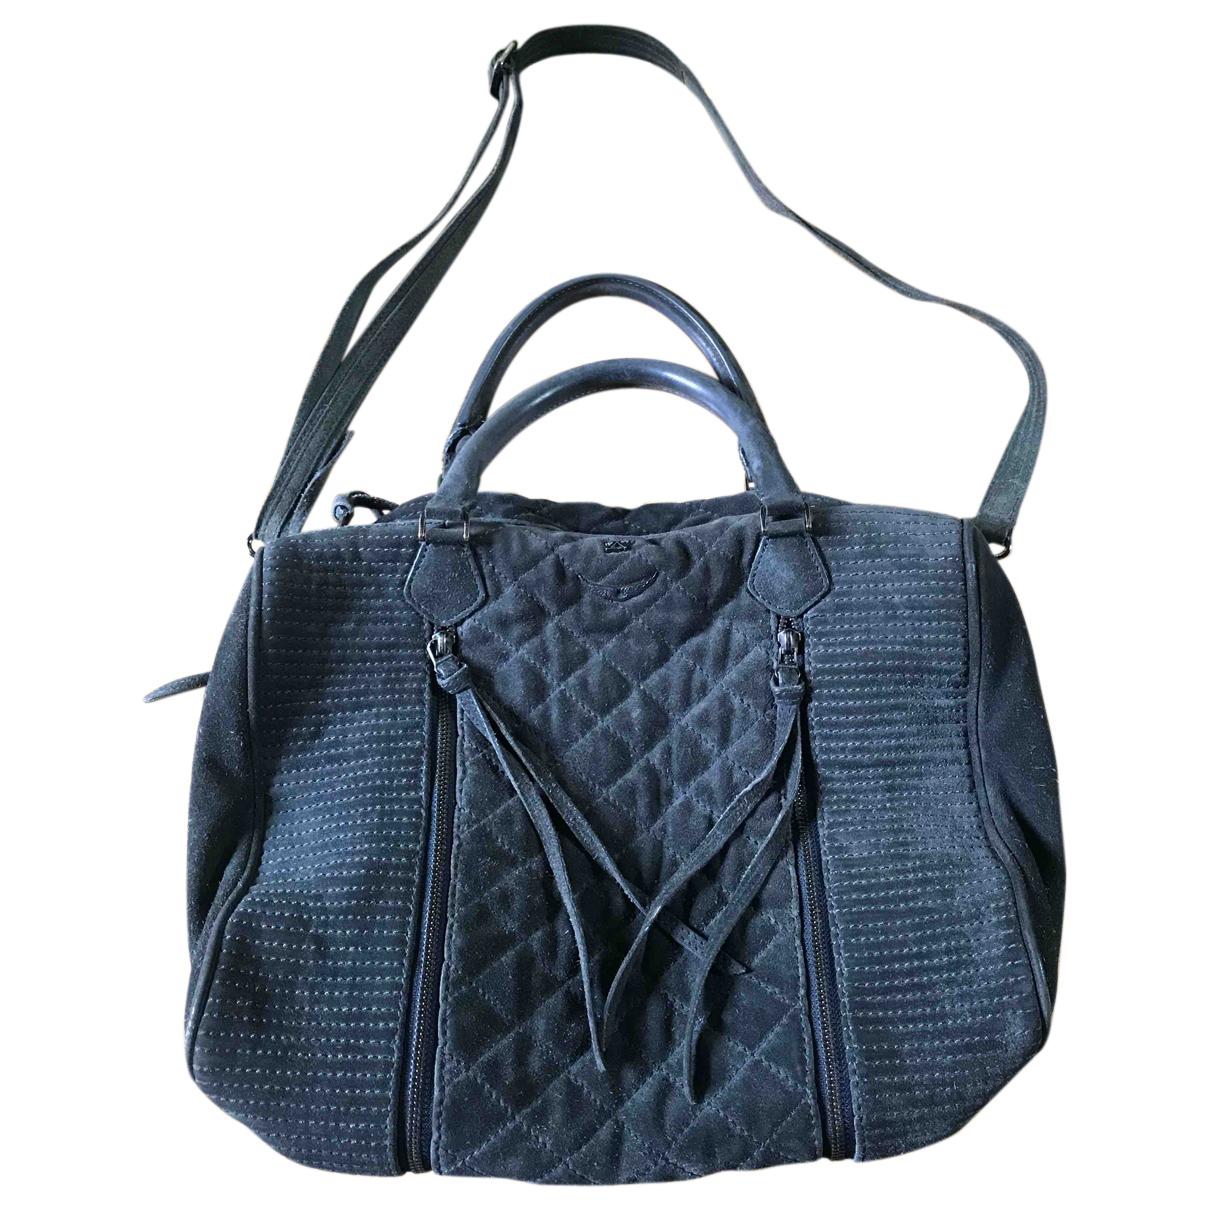 Zadig & Voltaire Sunny Grey Suede handbag for Women N